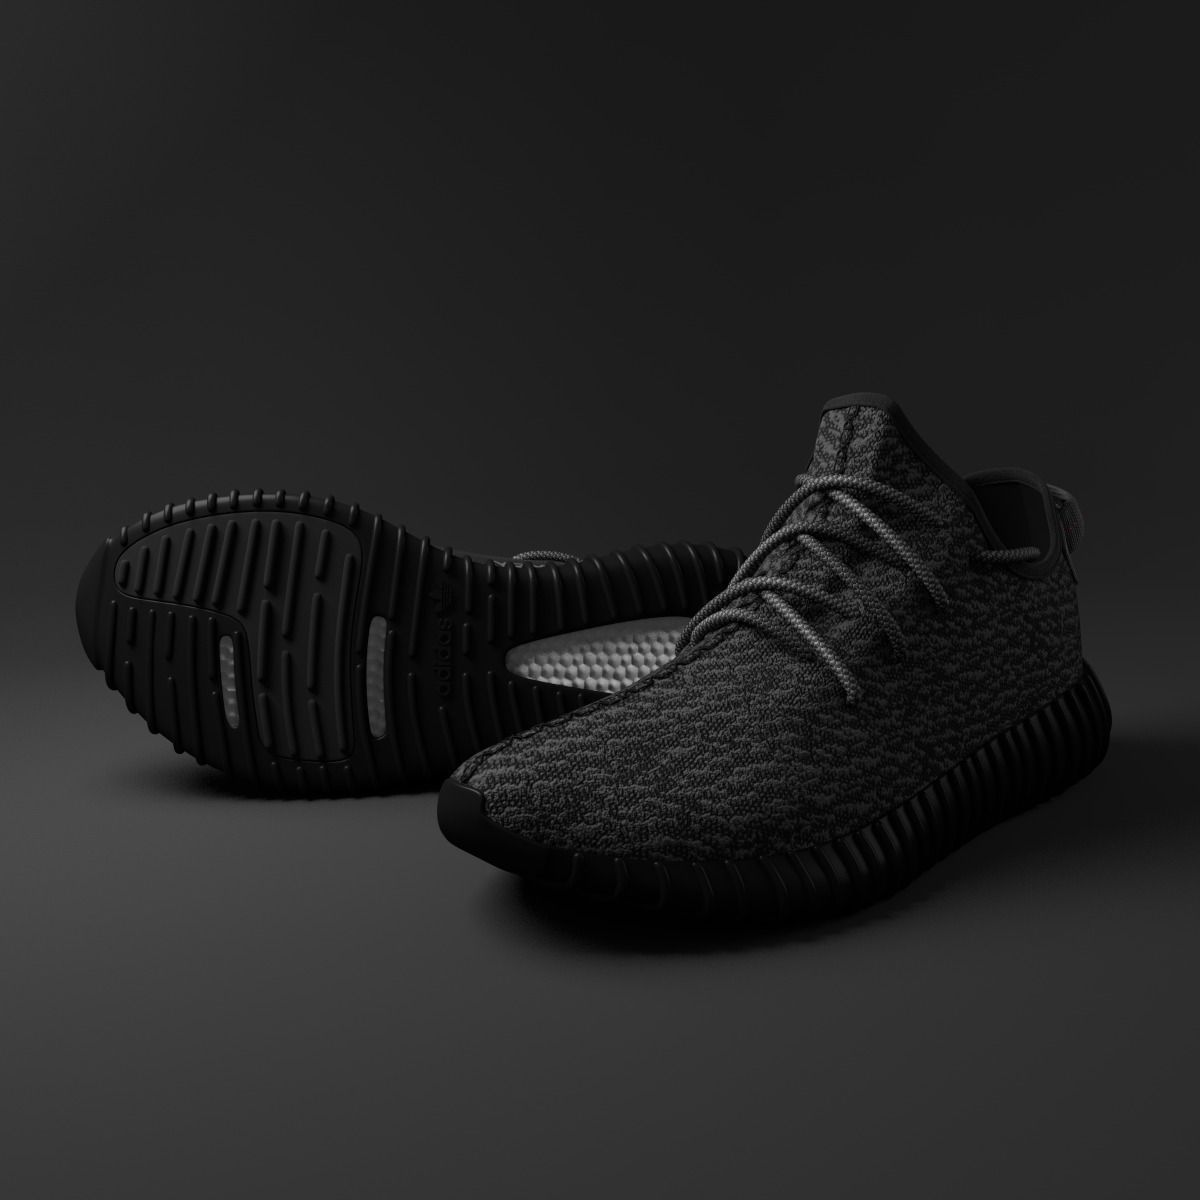 Adidas Shoes 3d Model